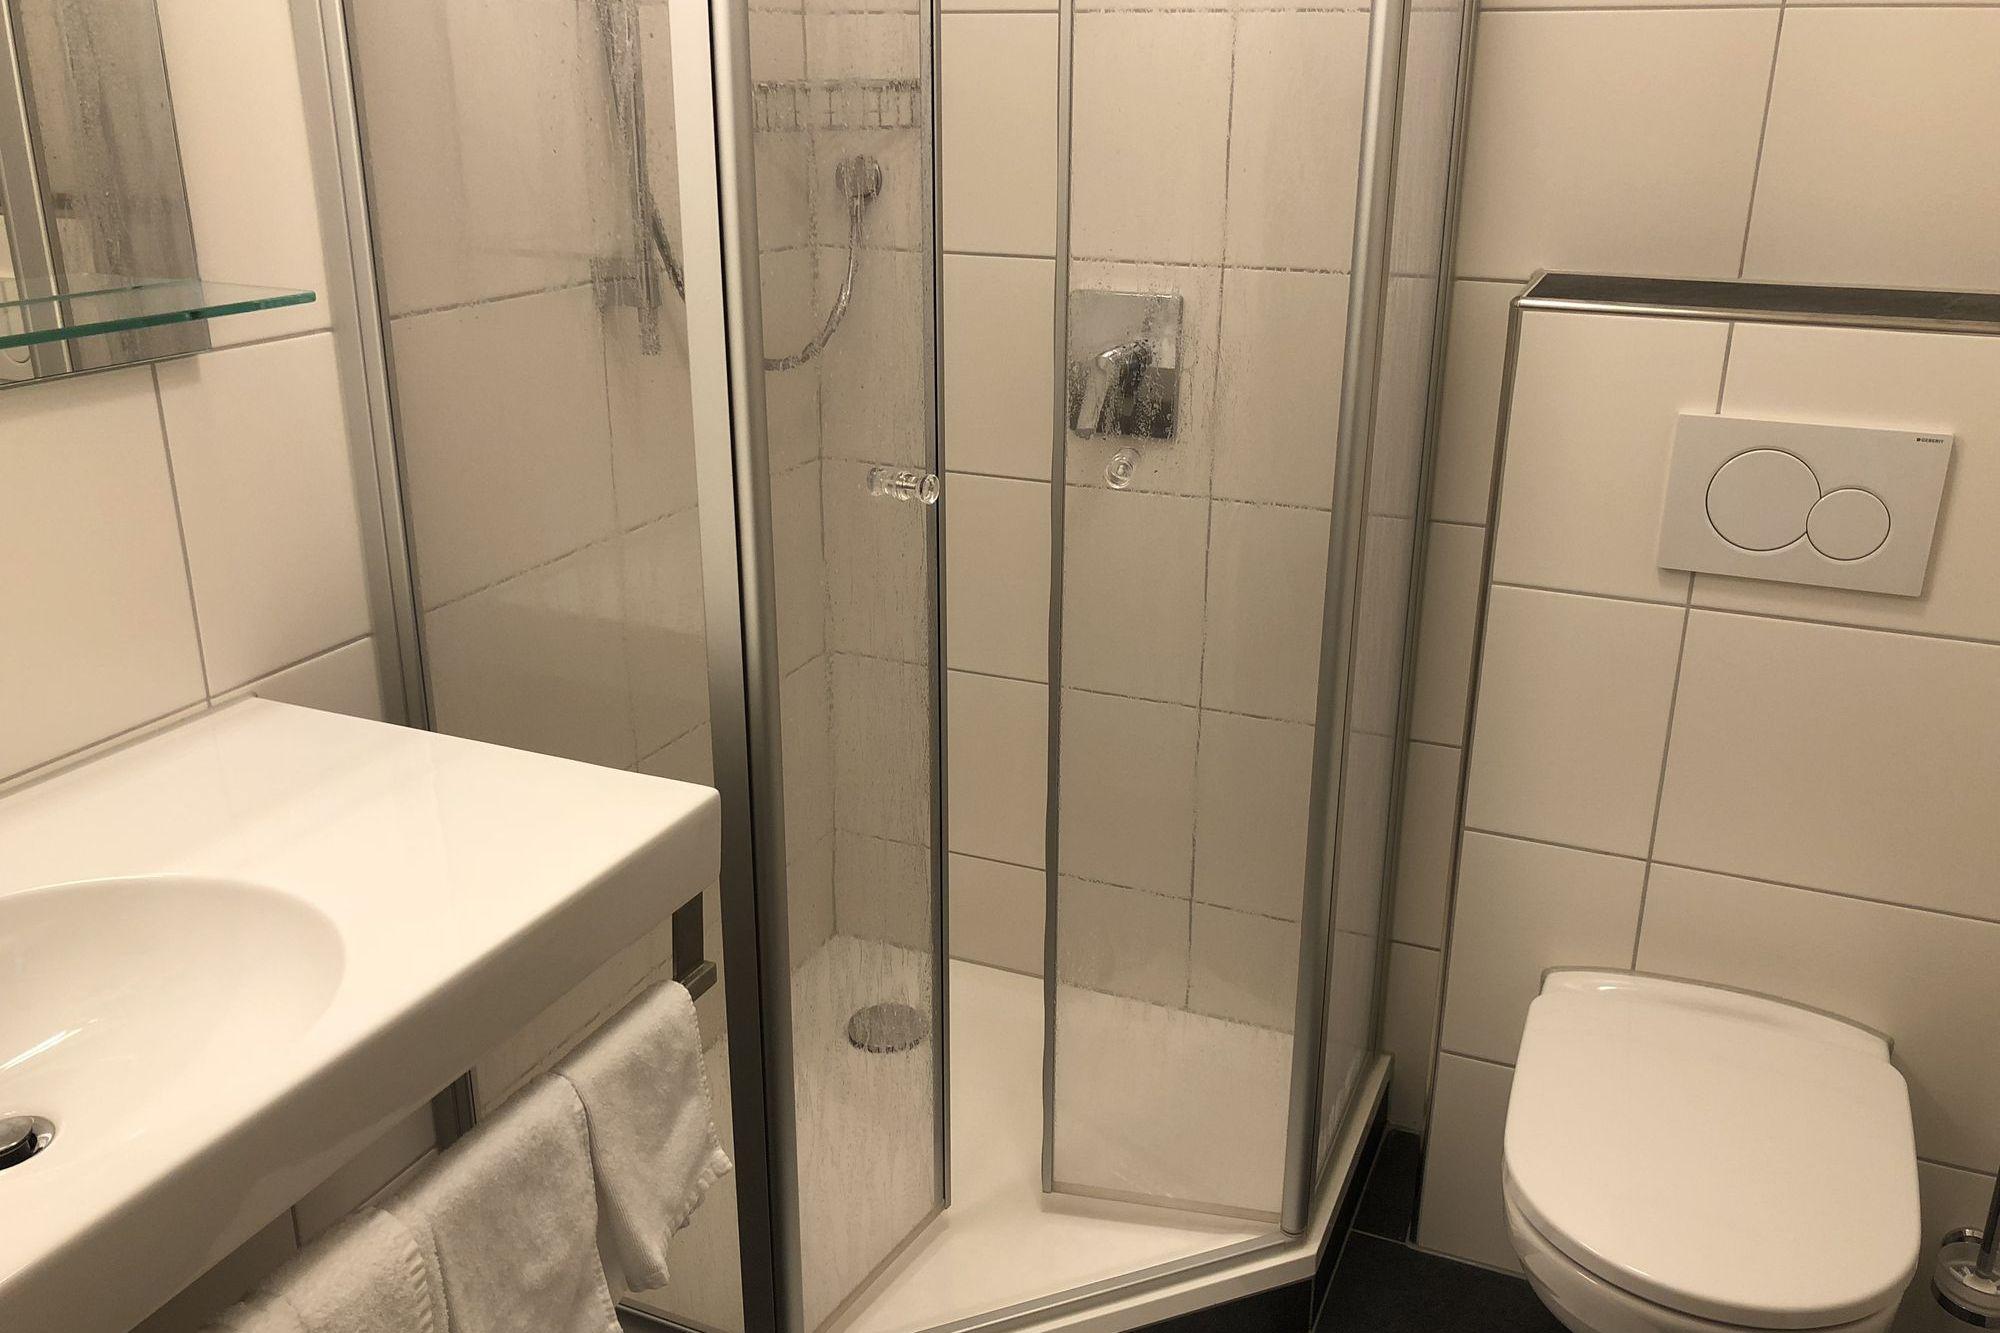 http://www.hotelbinder.de/wp-content/uploads/einzelzimmer1_3.jpg